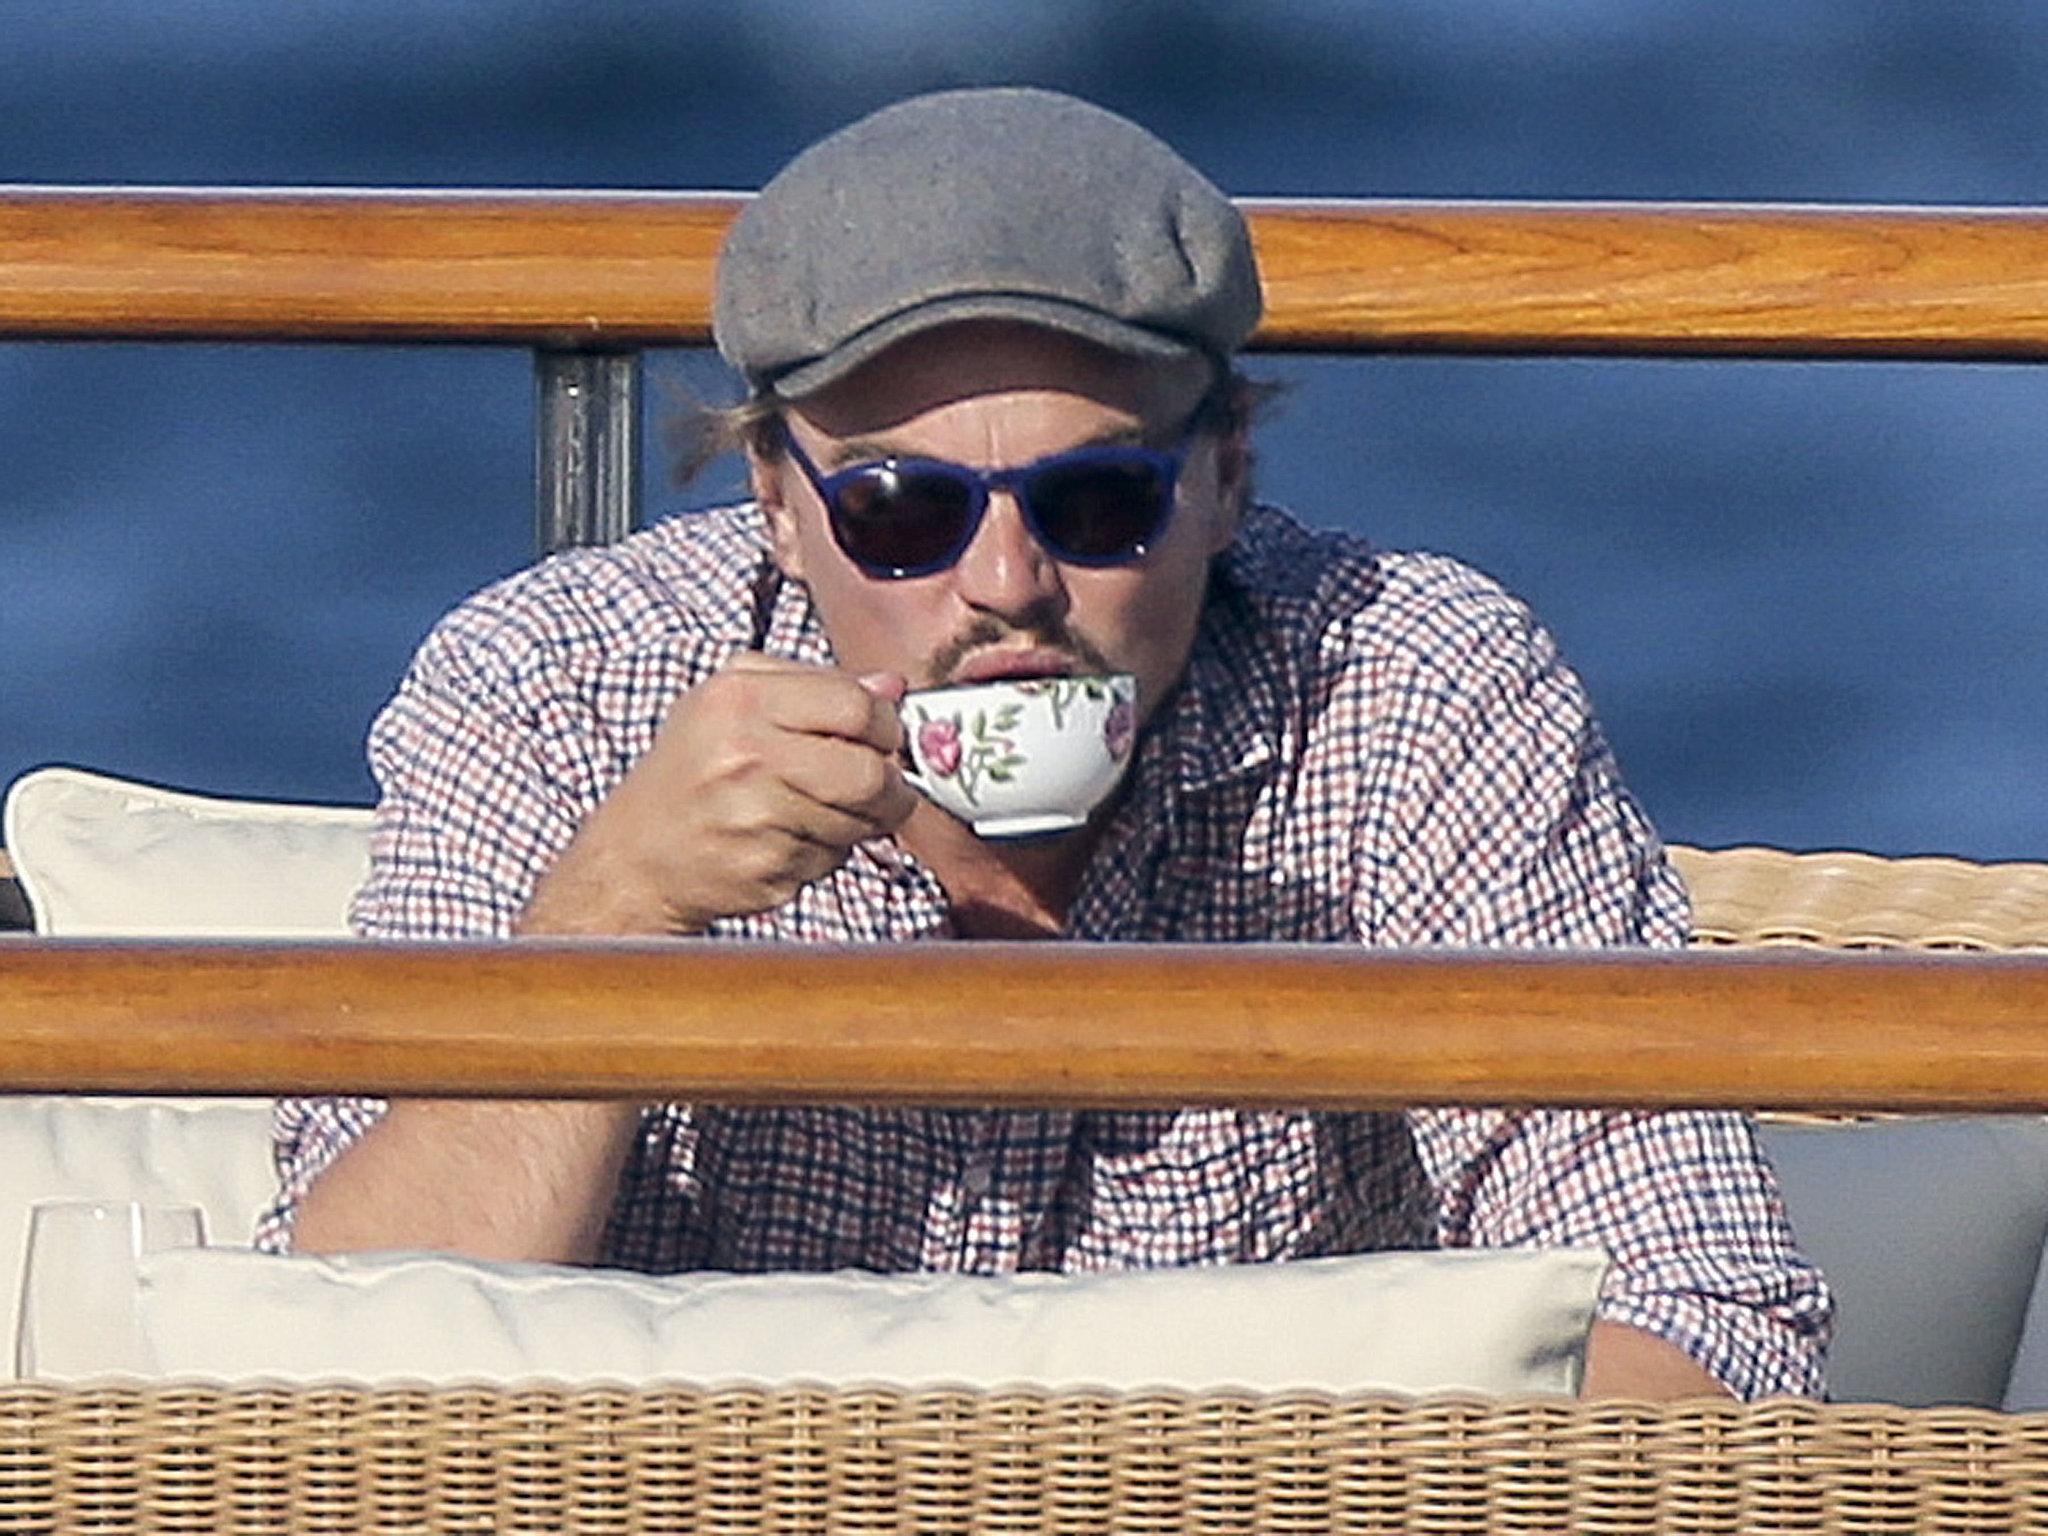 Or enjoy a cup of tea. Your choice.